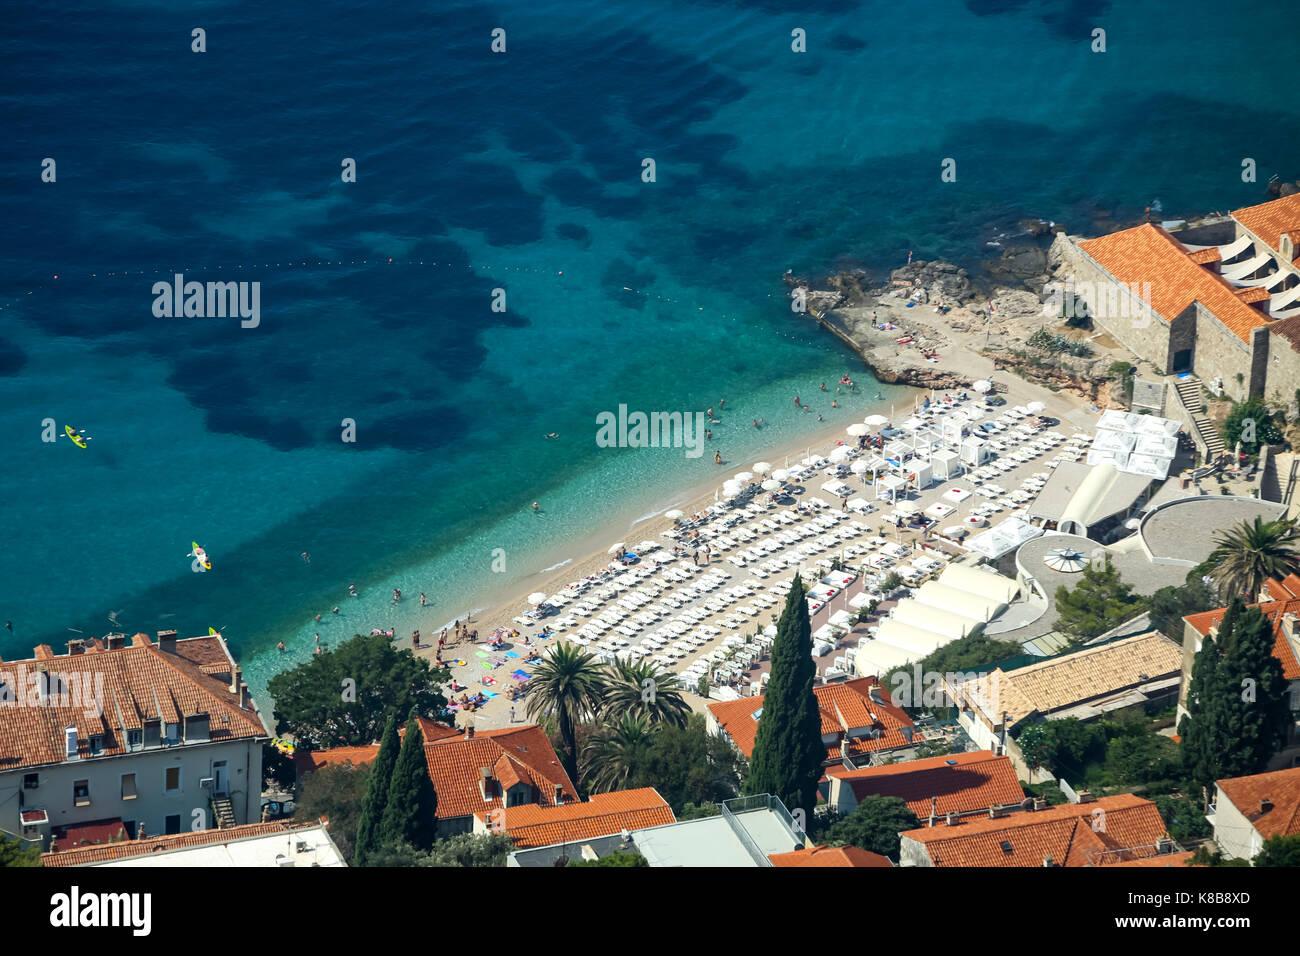 DUBROVNIK, CROACIA - Julio 19, 2017 : Una vista aérea de la playa Banje en Dubrovnik, Croacia. Foto de stock